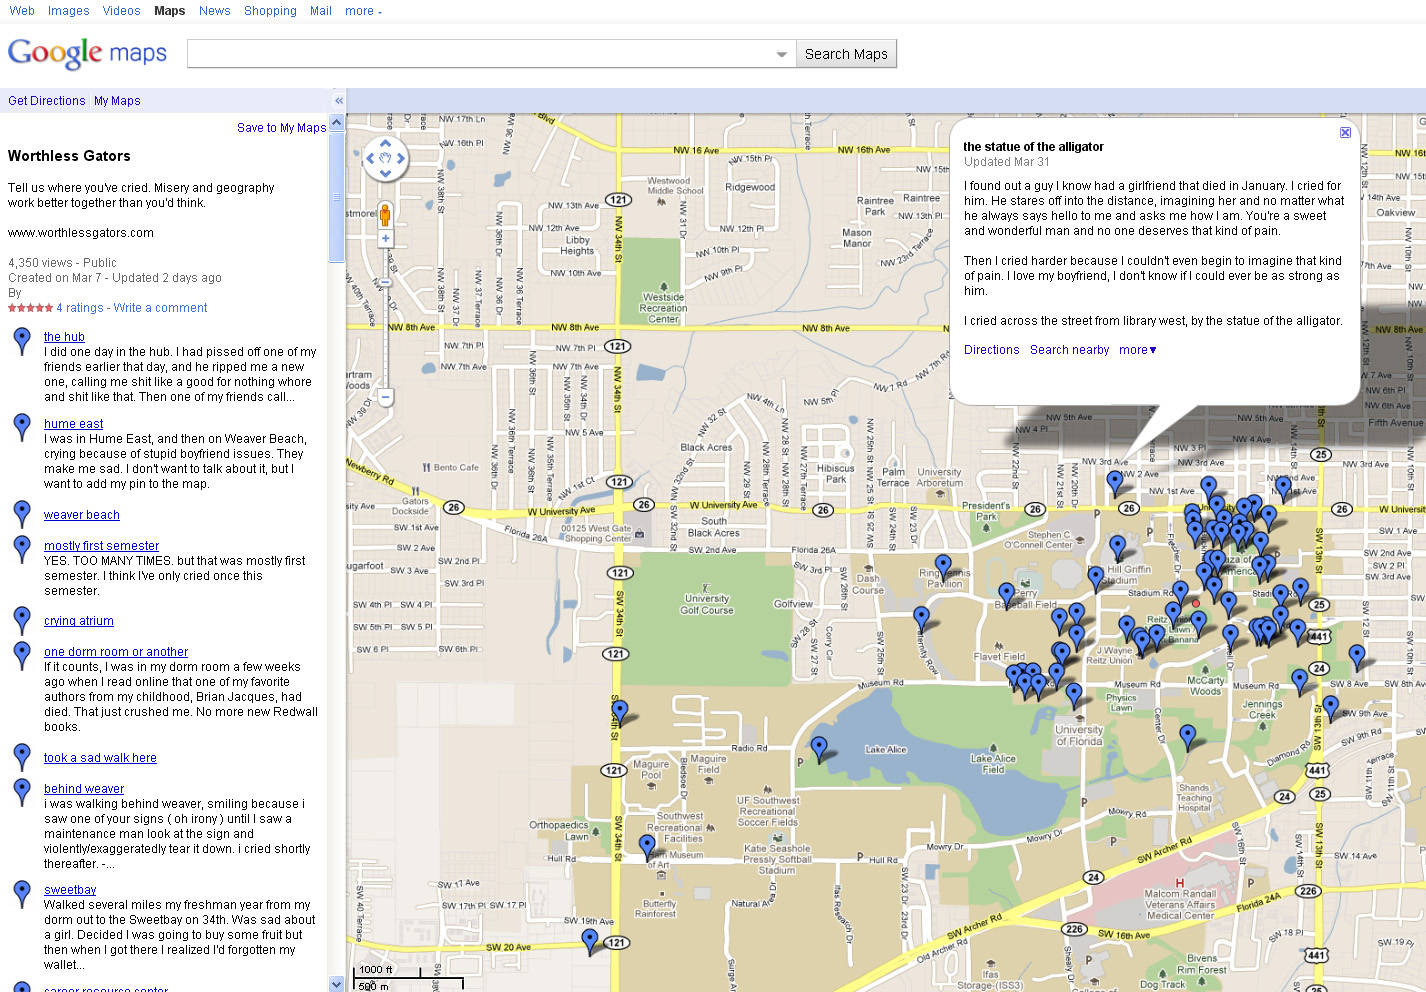 Map University Of Florida.Sad Maps At University Of Florida